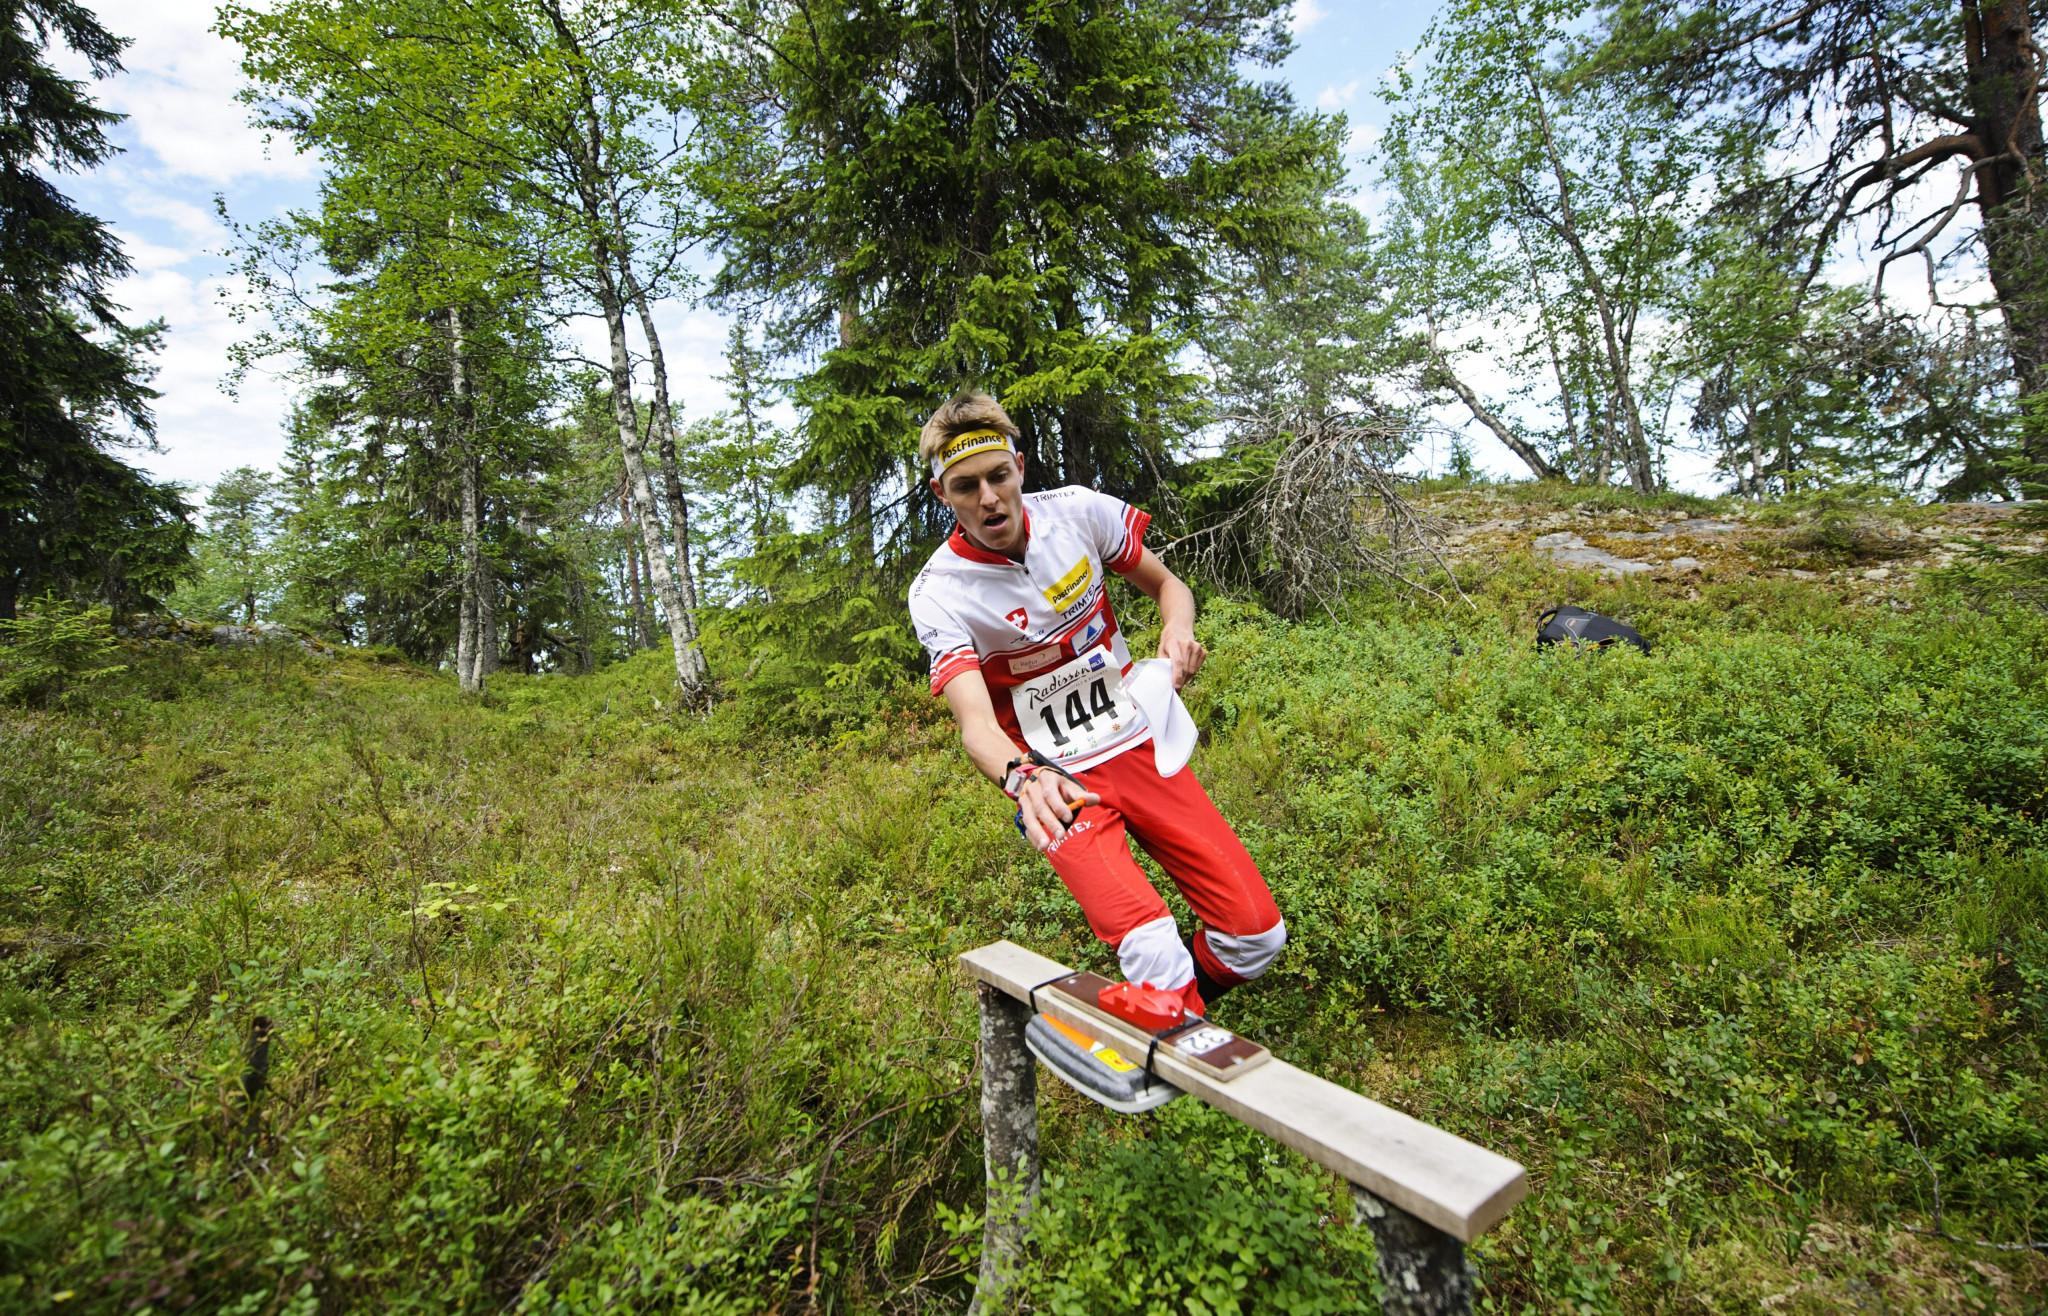 Second round of Orienteering World Cup set to get underway in Sweden